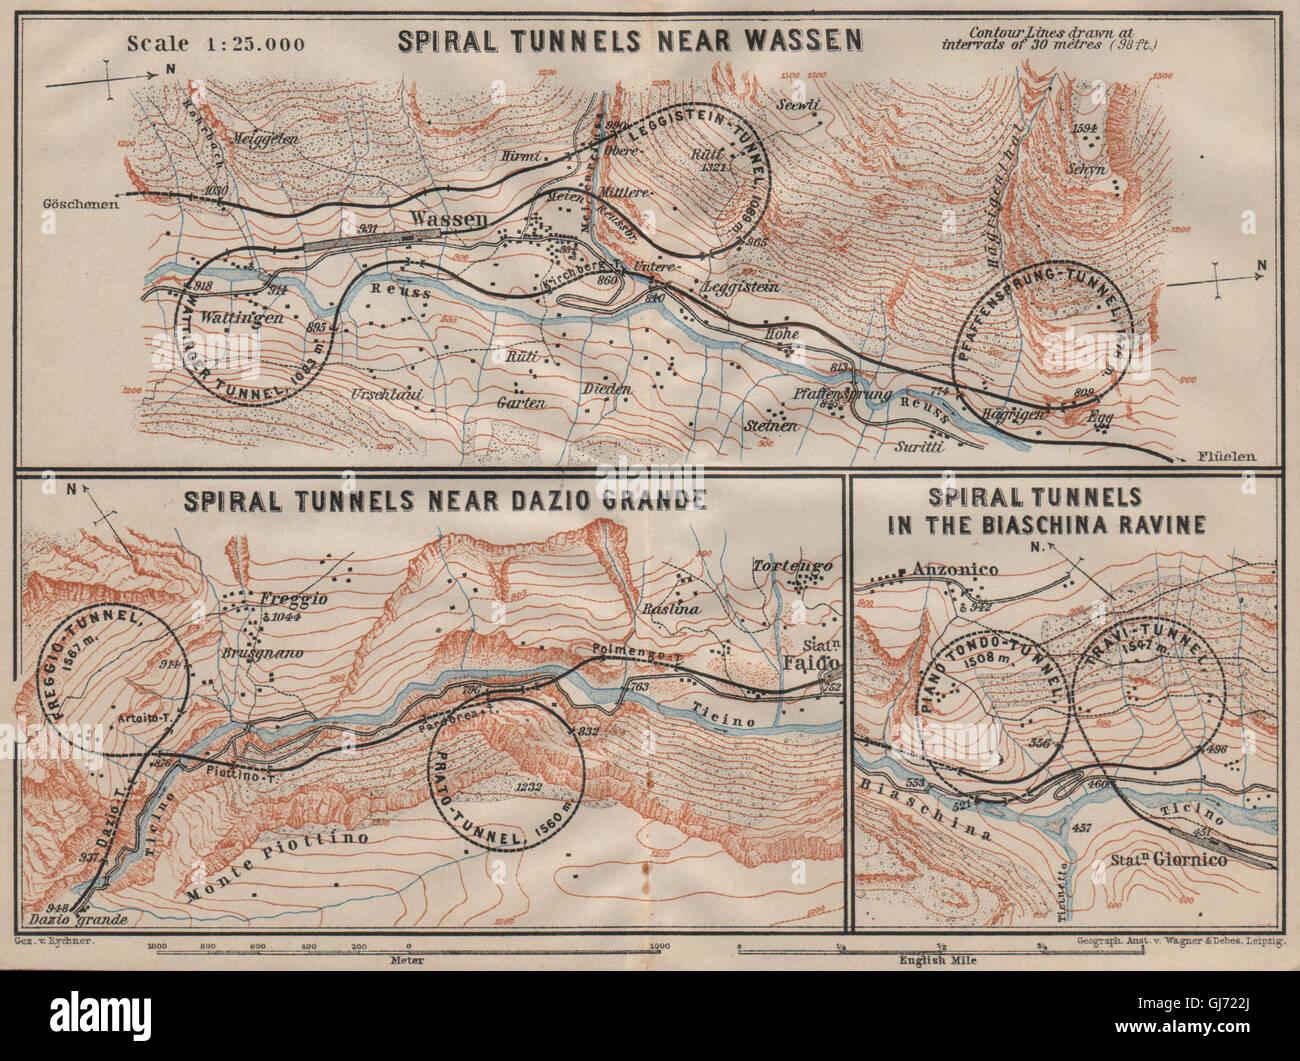 ST GOTTHARD RAILWAY SPIRAL/LOOP TUNNELS Wassen Freggio Prato Biaschina, 1911 map Stock Photo